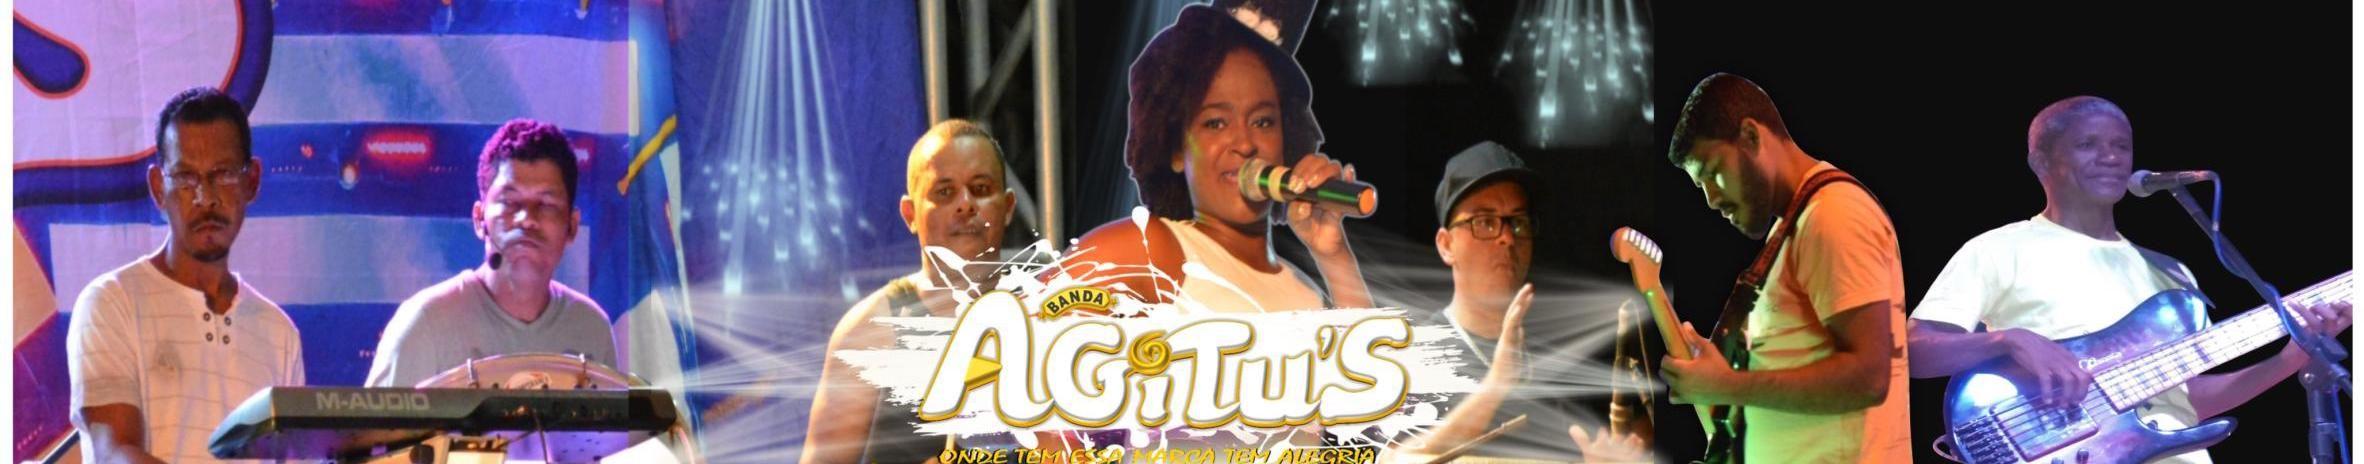 Imagem de capa de Banda Agitu's